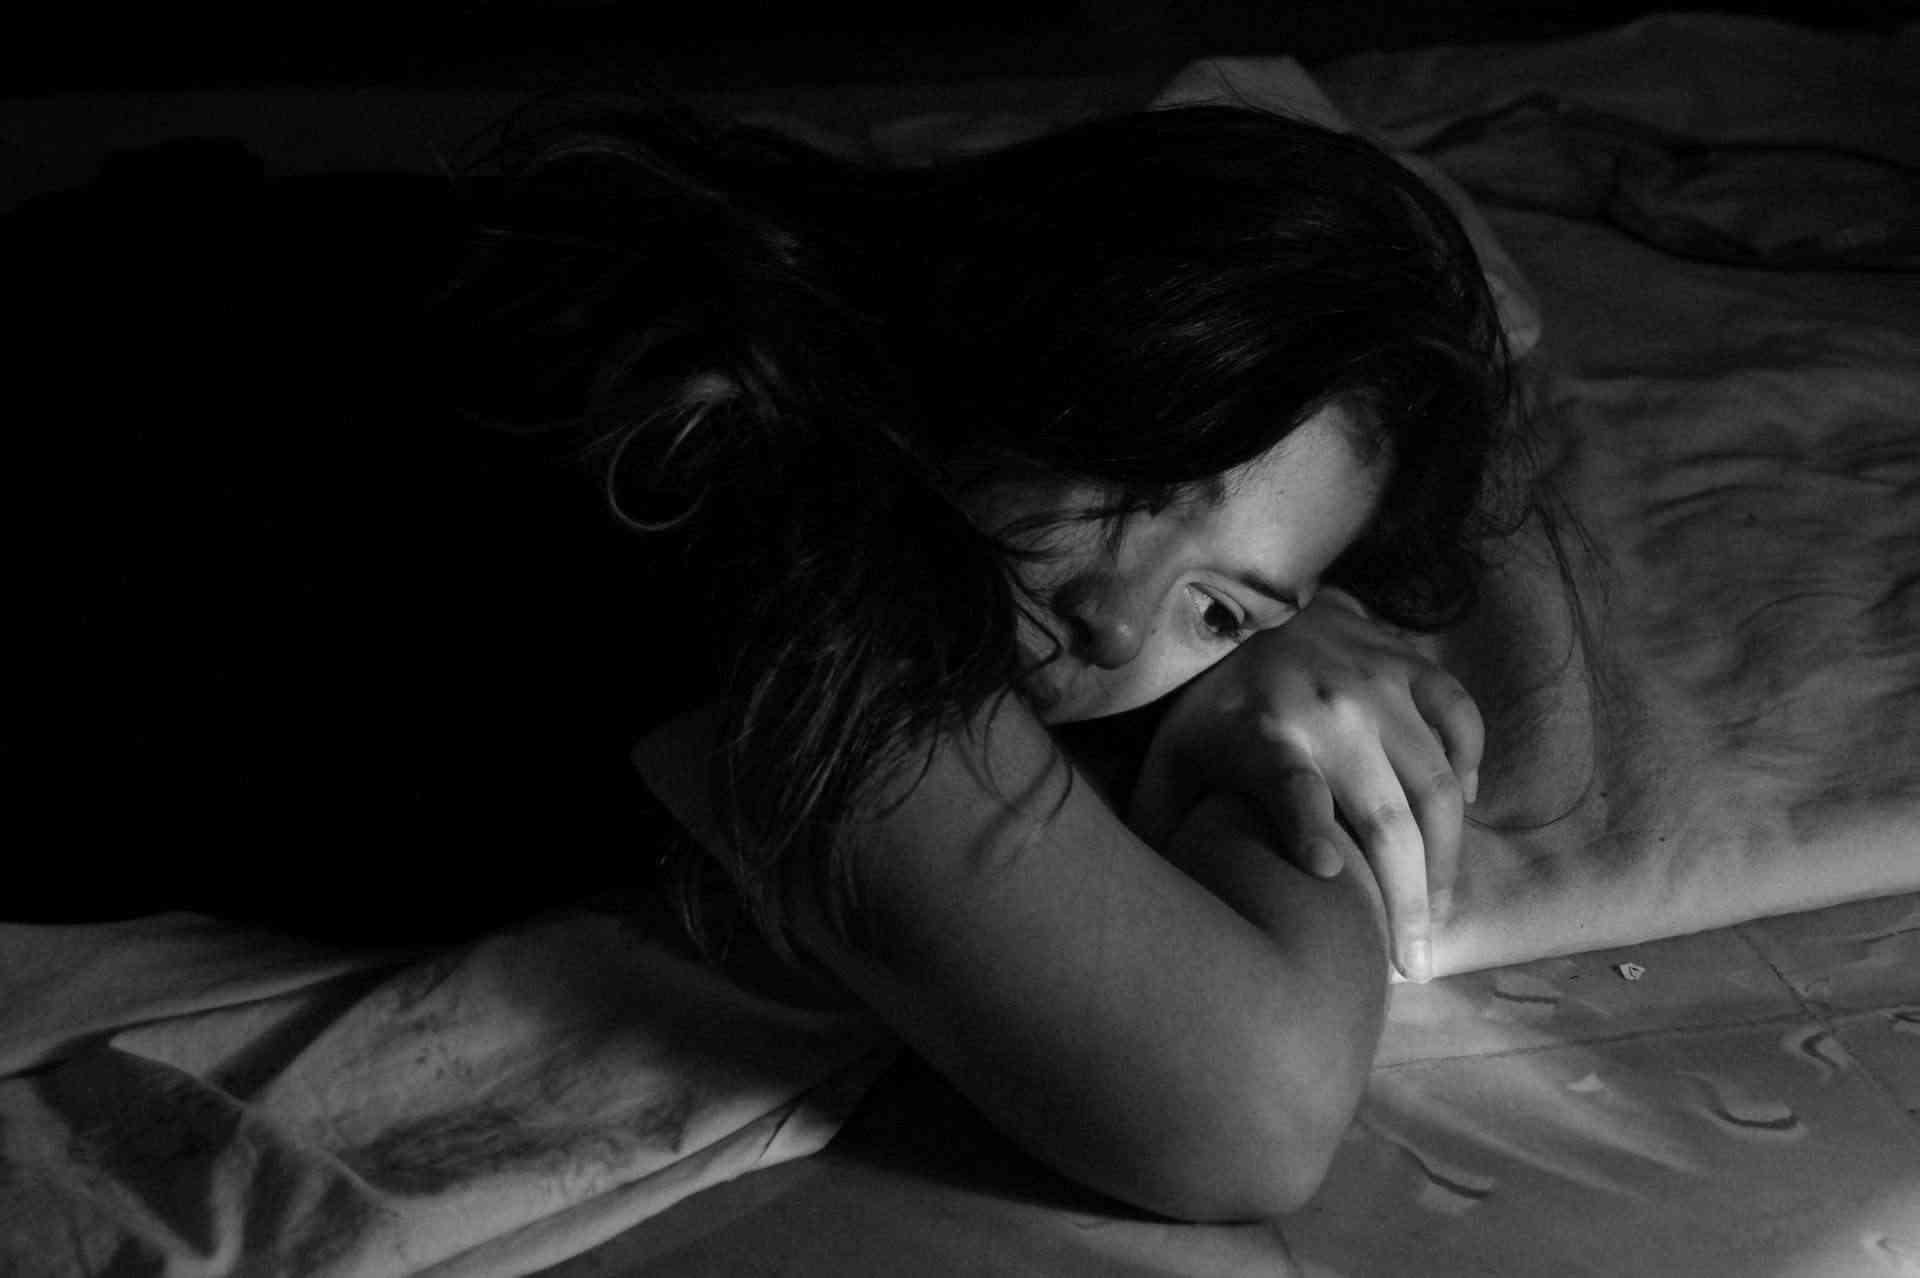 Death Tales {Little Baby, Sweetly Sleep}